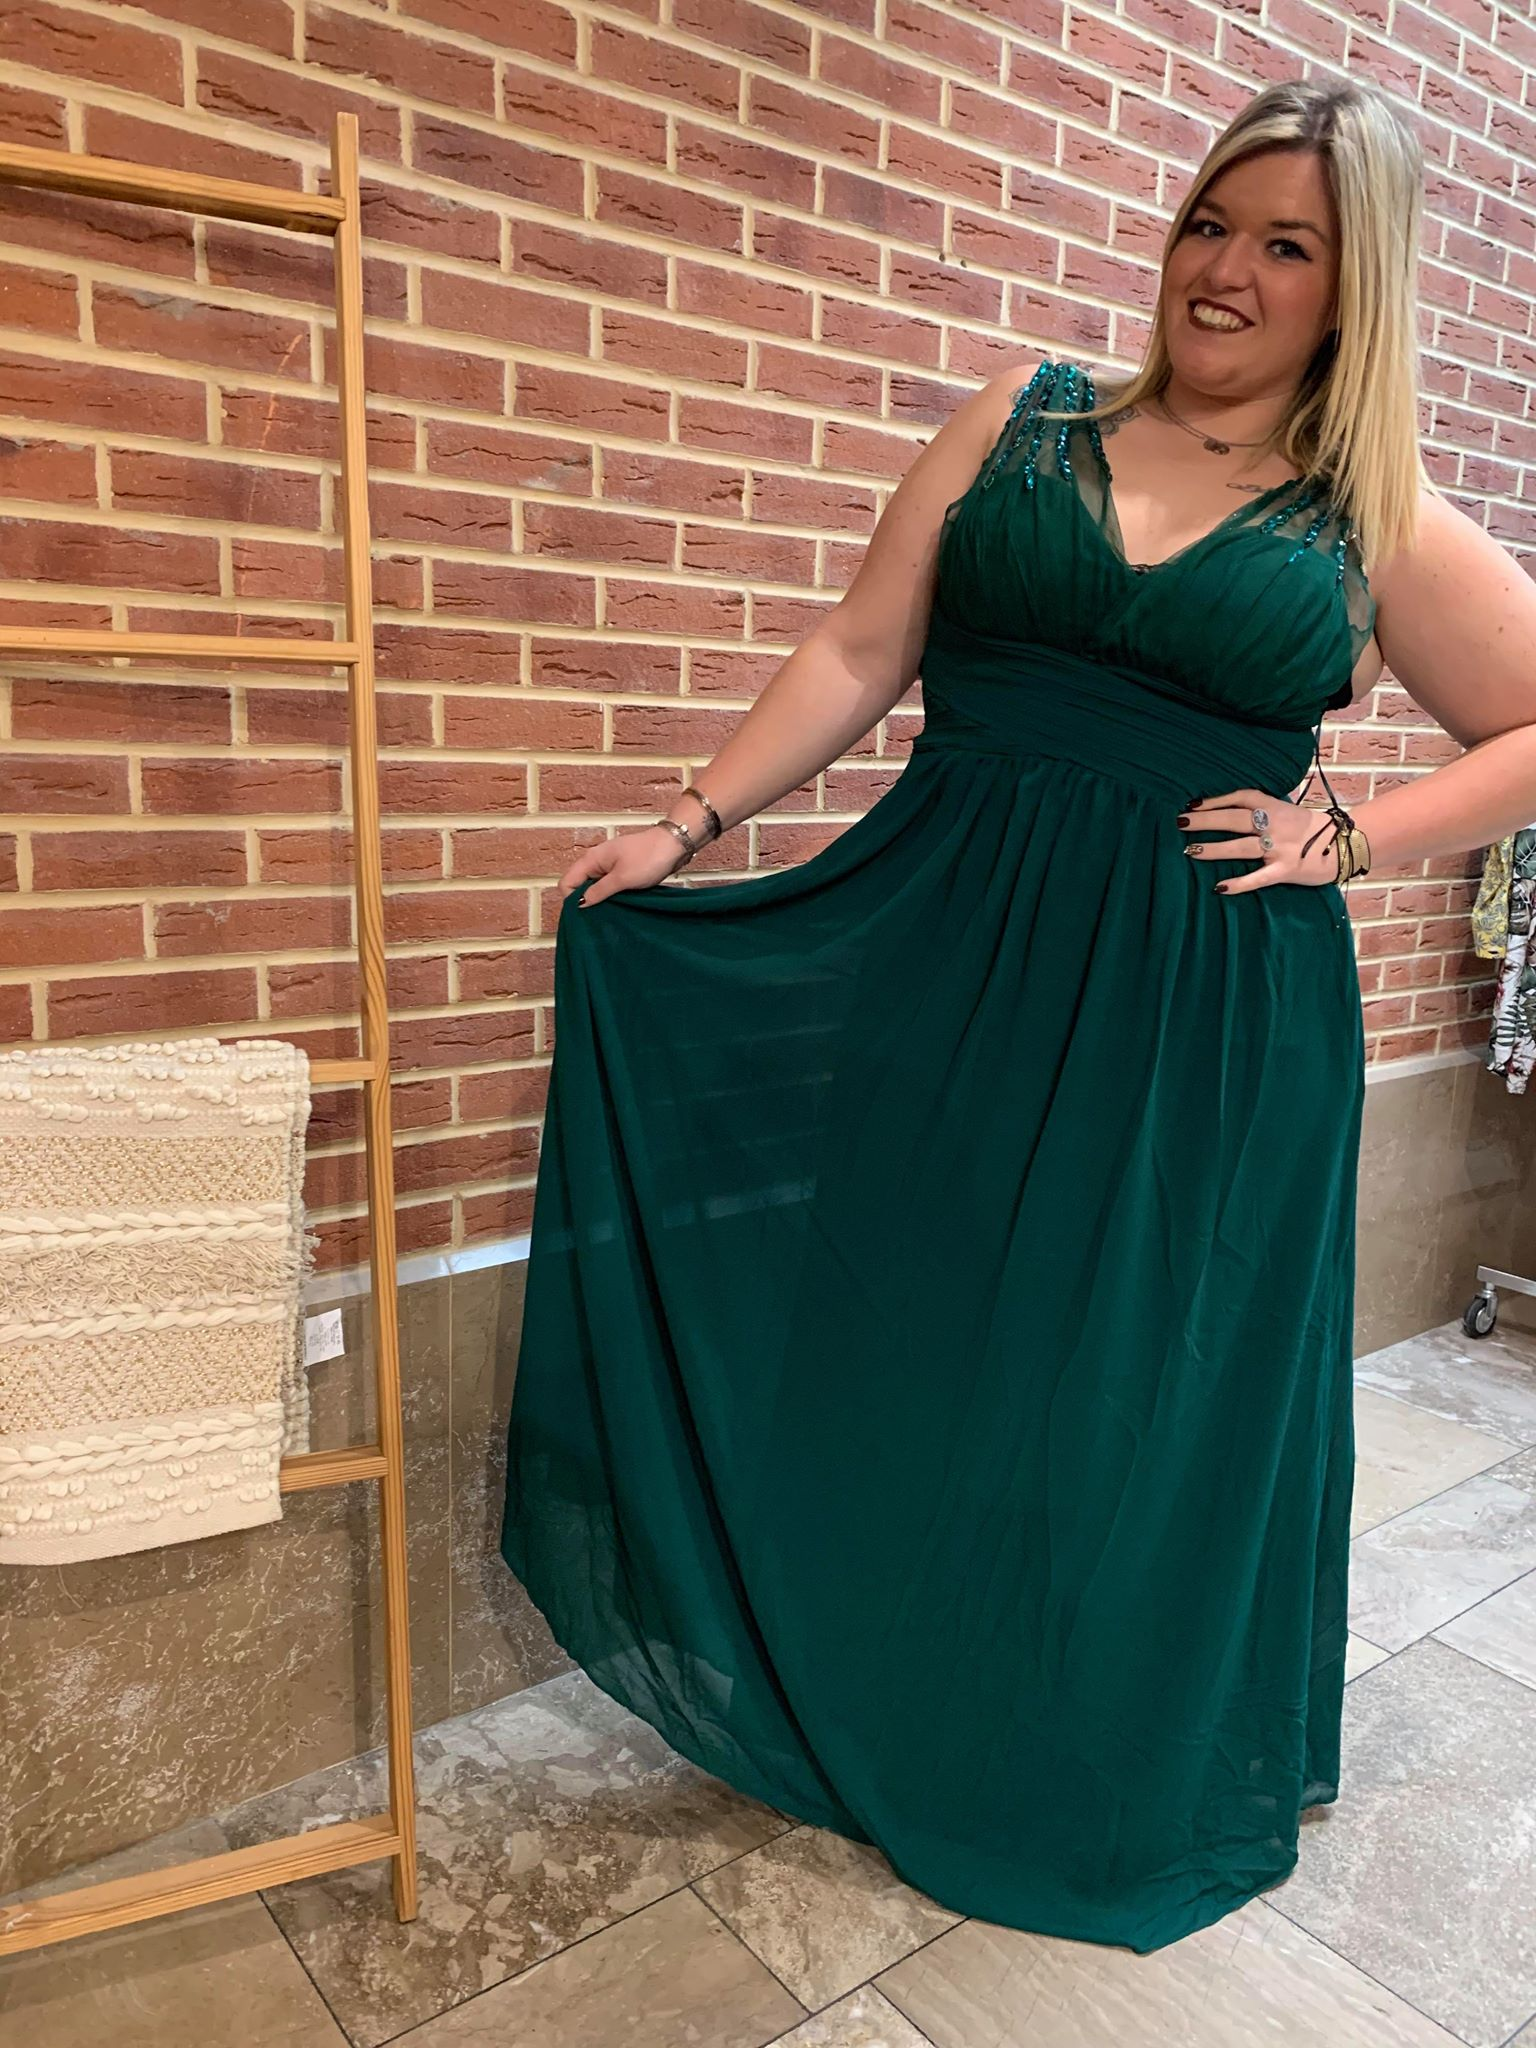 robe de soirée verte Curvy - ROB_SOI_VER_CUR